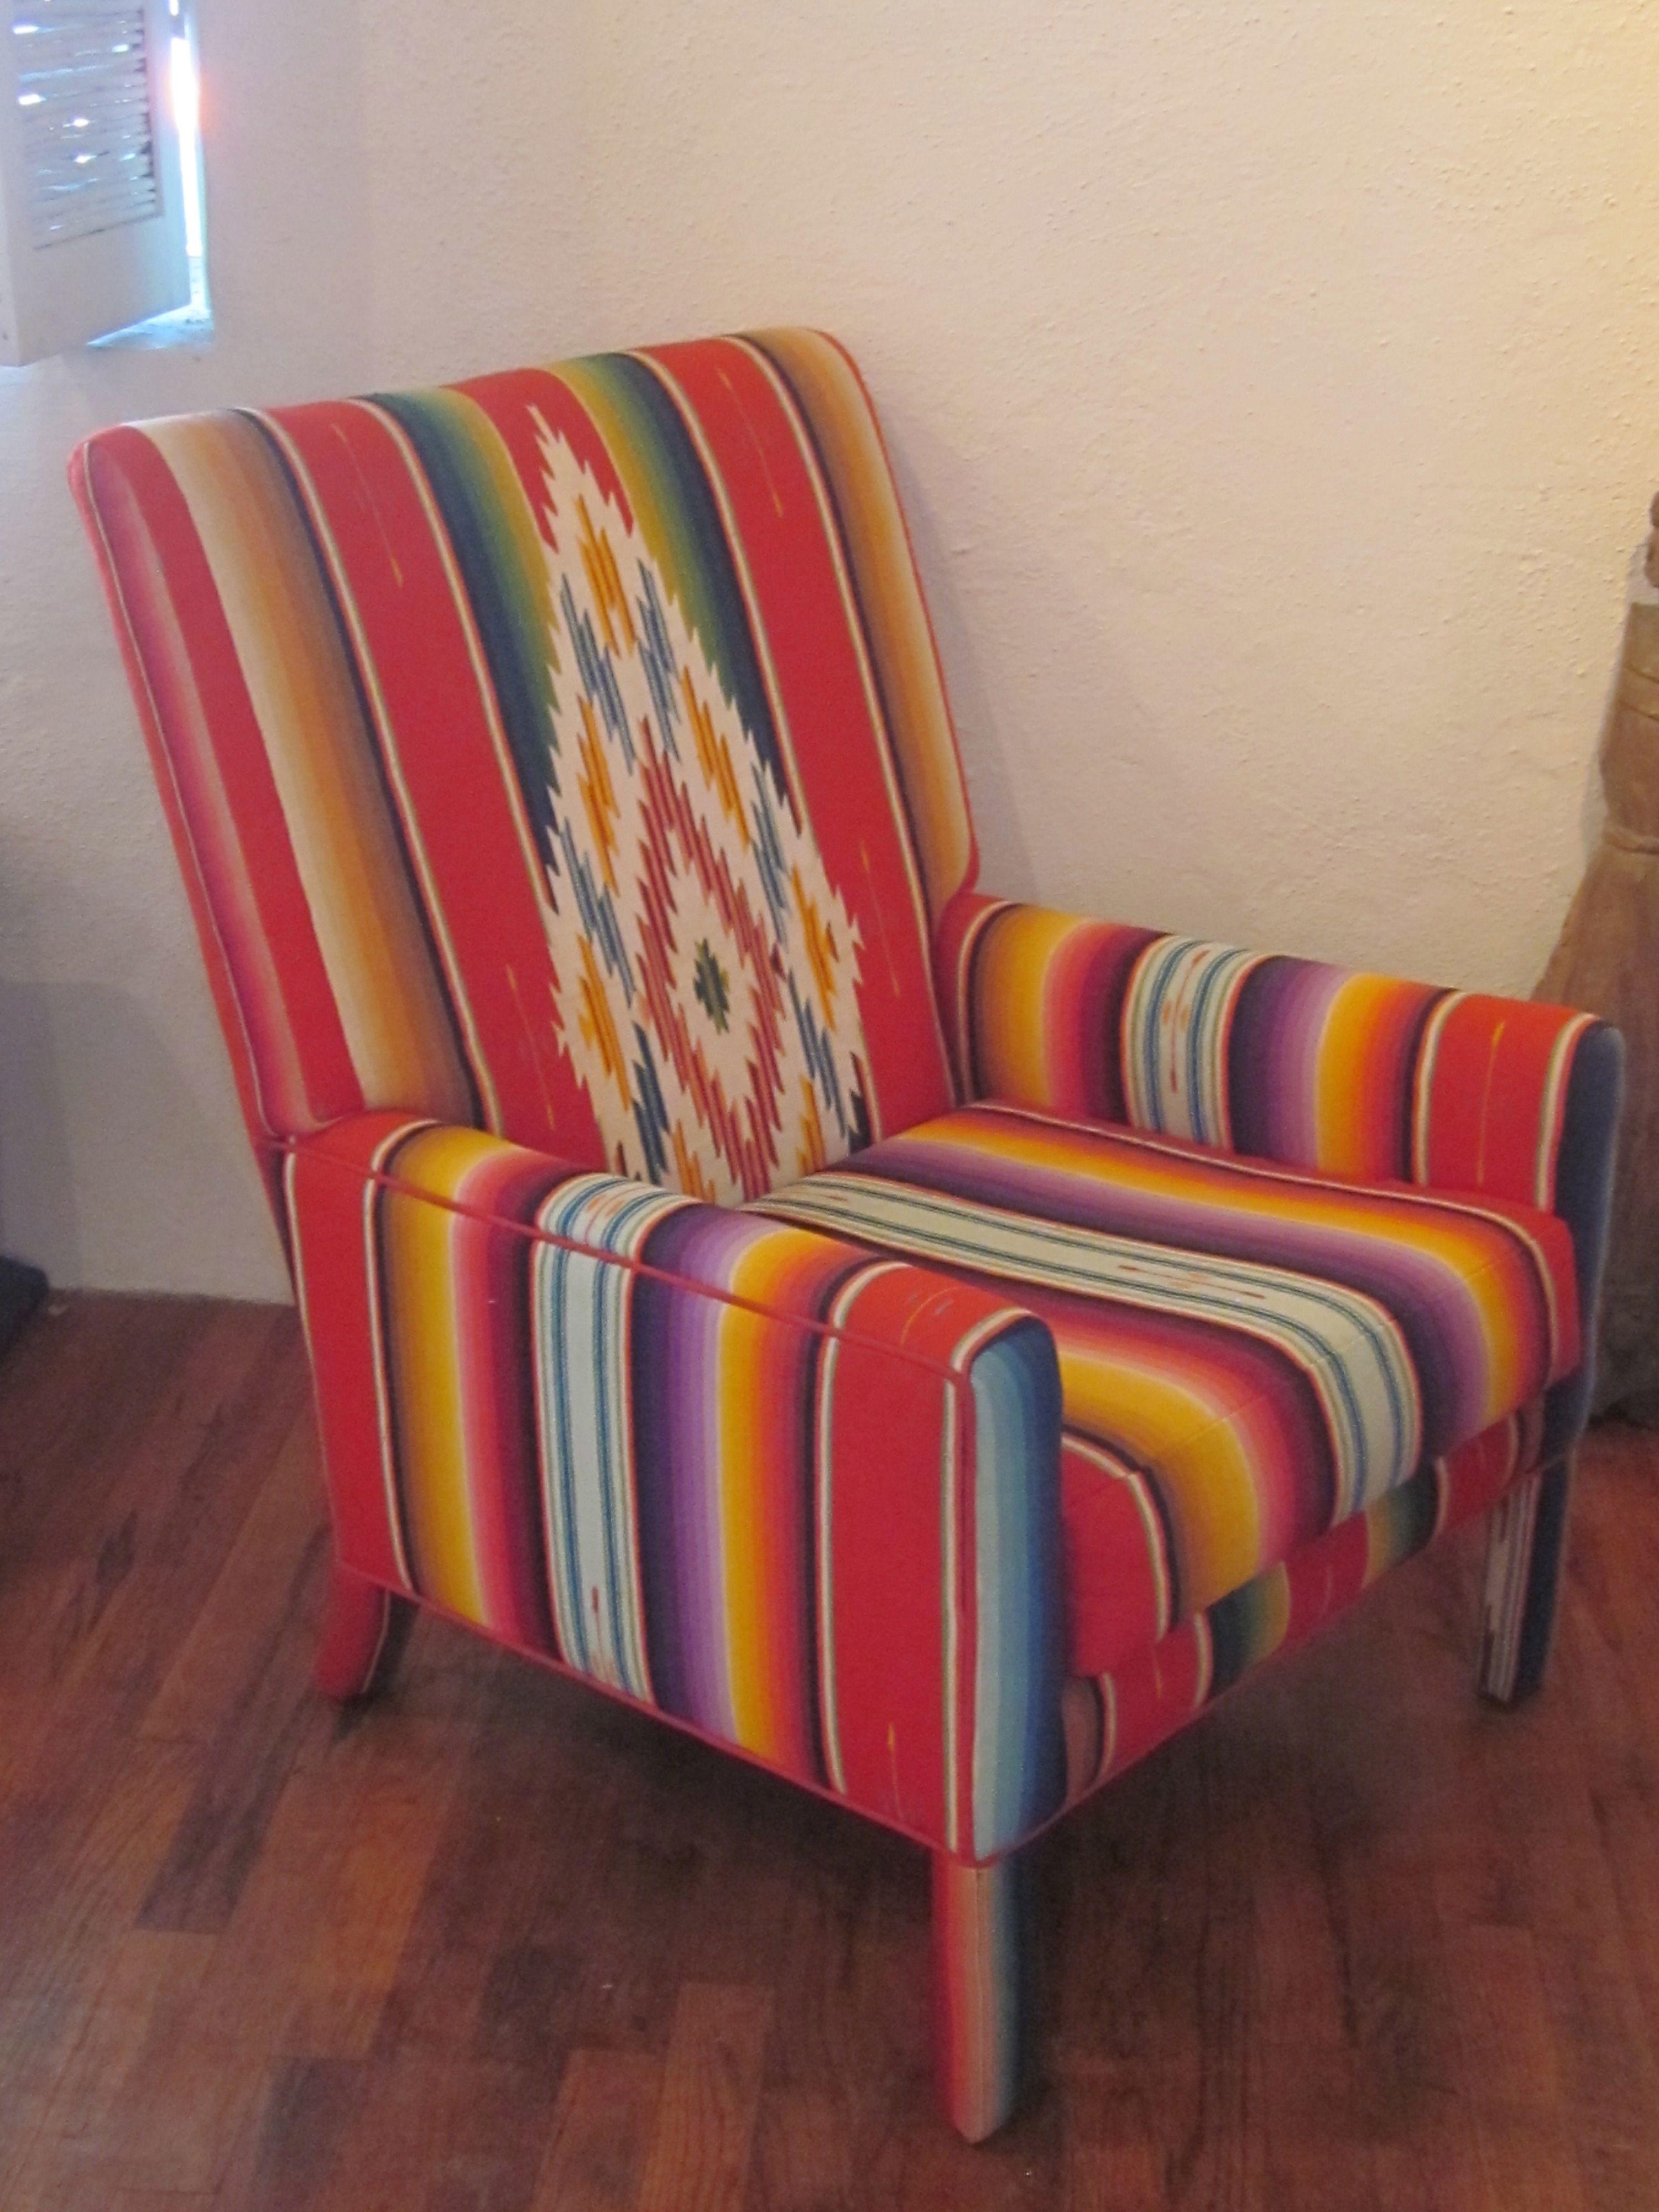 Funky Sofas Nz Mariposa Sofa Pris Chair Upholstered In Vintage Zarape